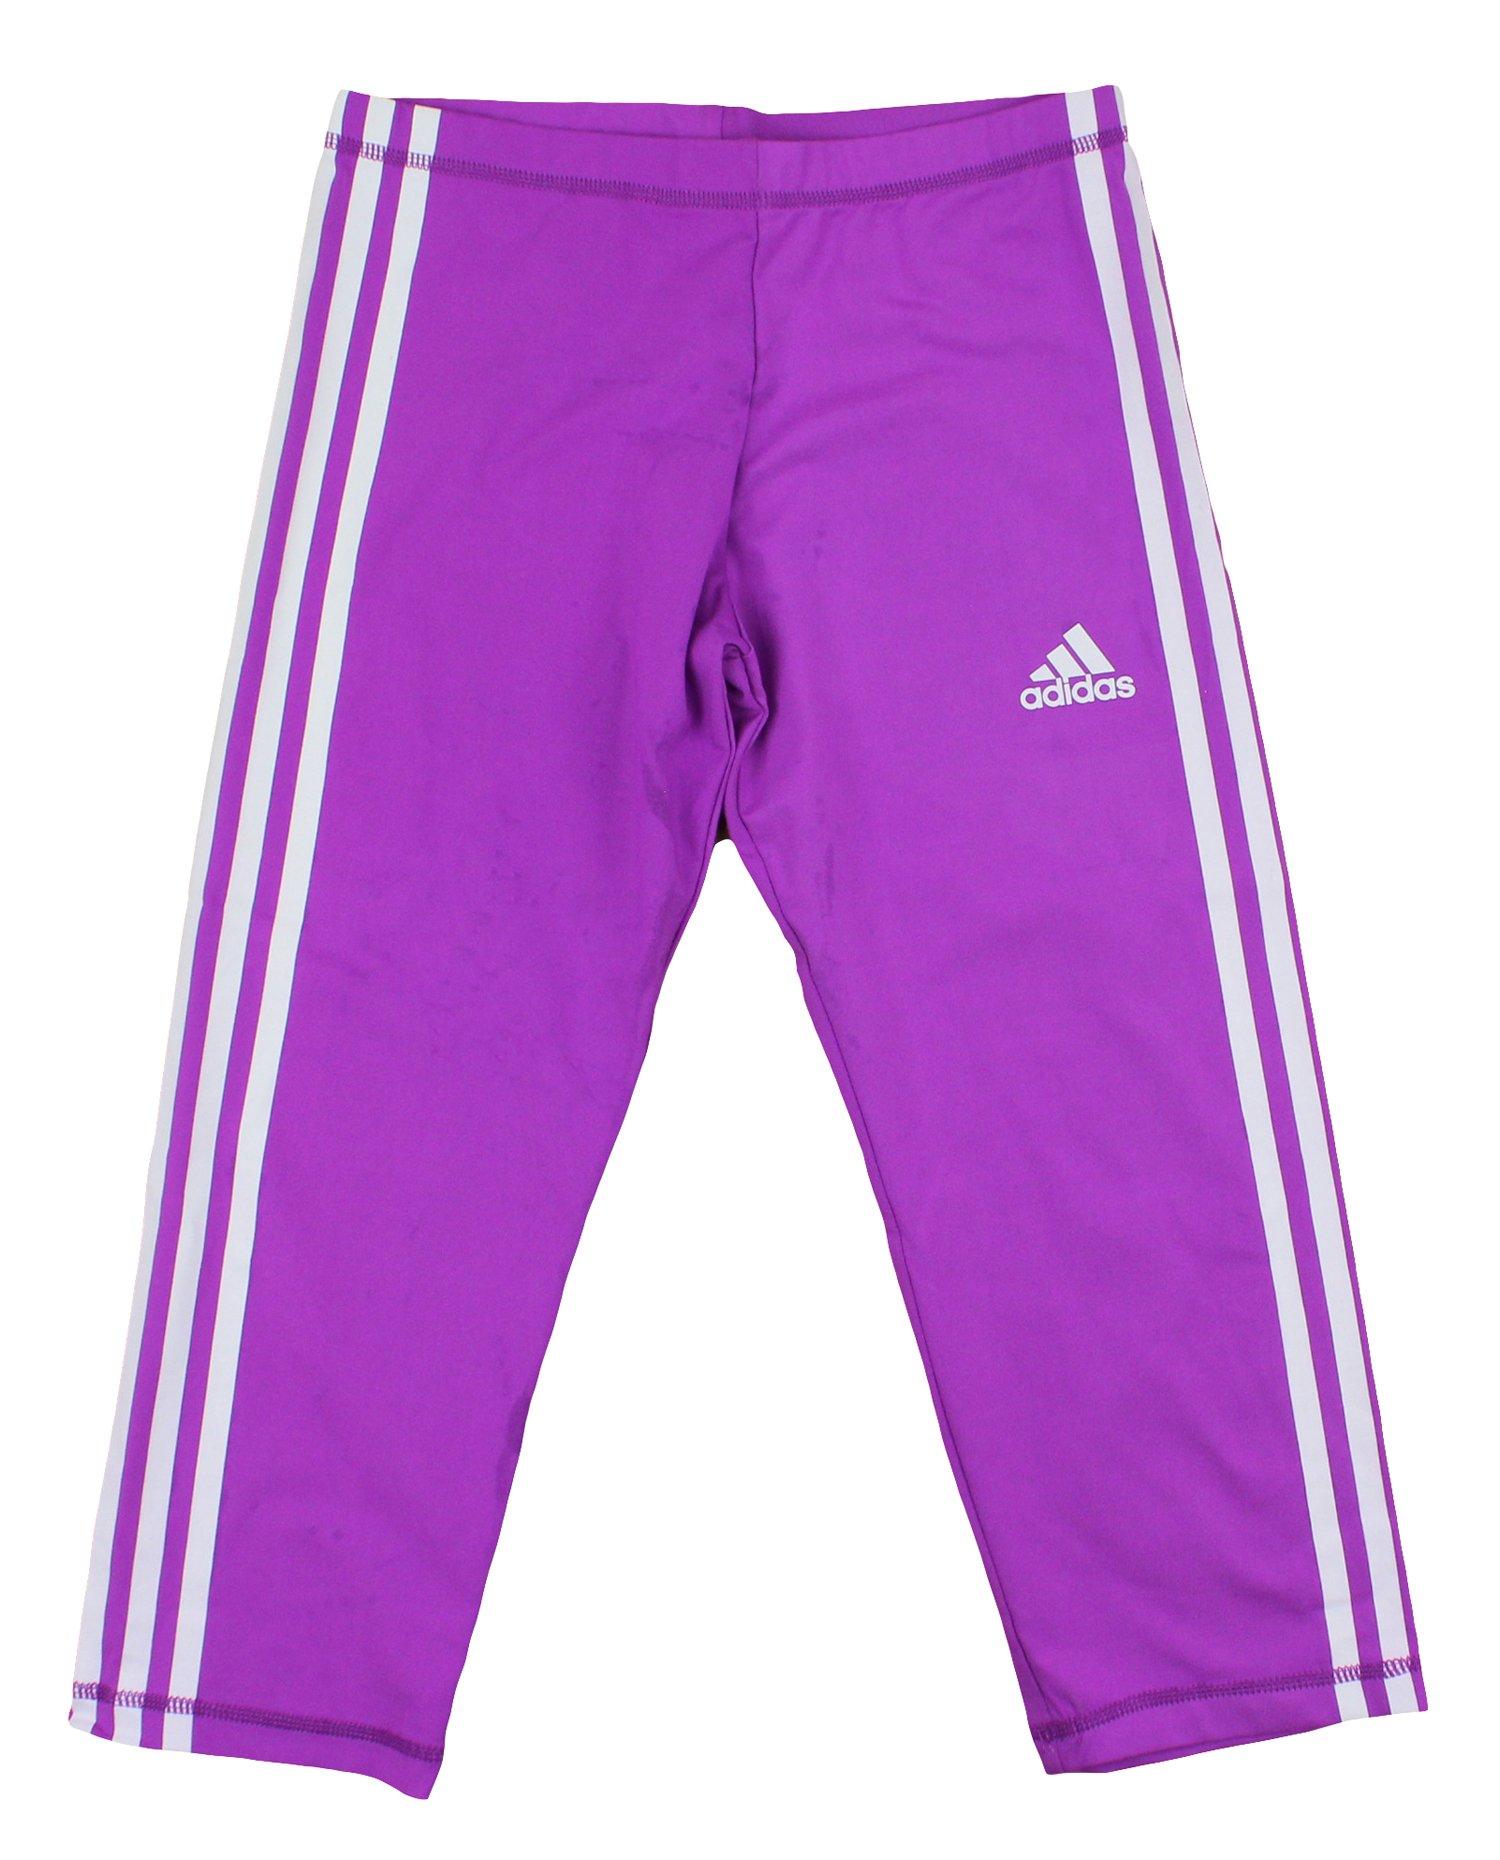 Adidas Youth Big Girls Global Capri Leggings (Large (14), Fluorescent Pink/White)